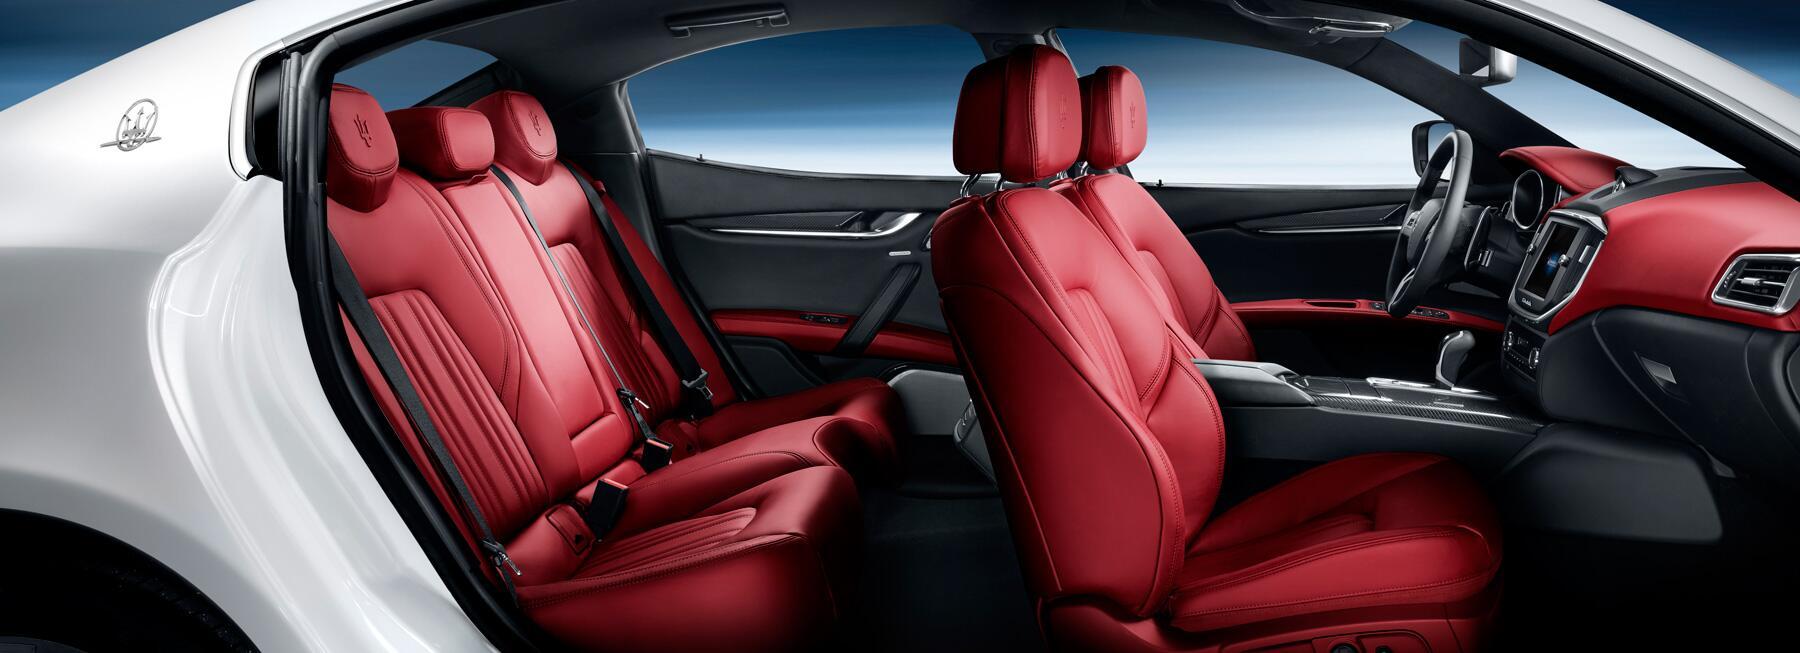 2014 - [Maserati] Ghibli - Page 6 BIRCbgzCIAAQmlO